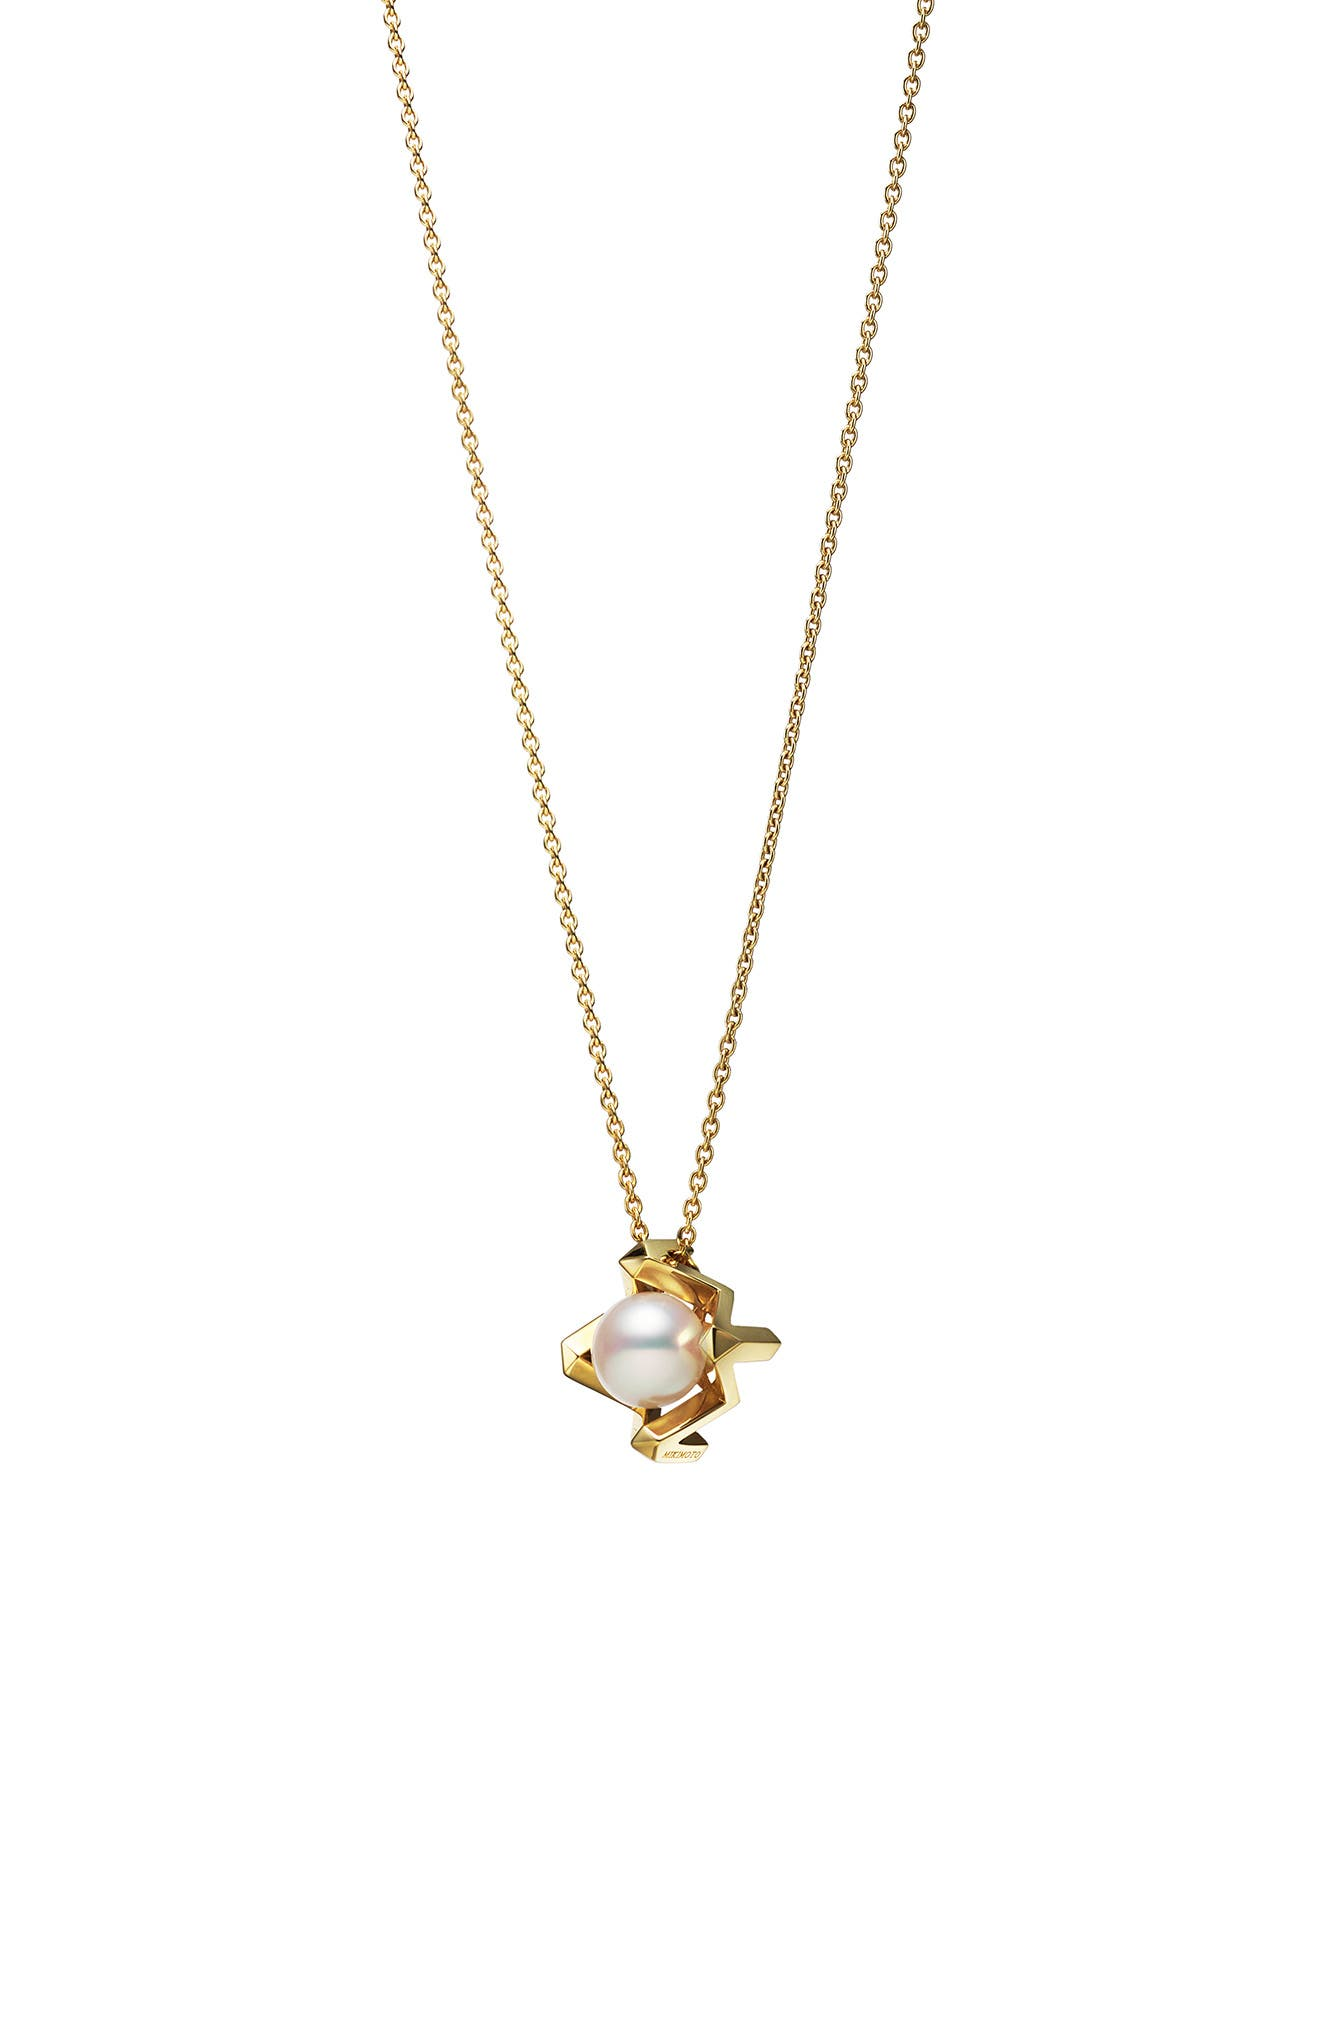 M Cultured Pearl Pendant Necklace